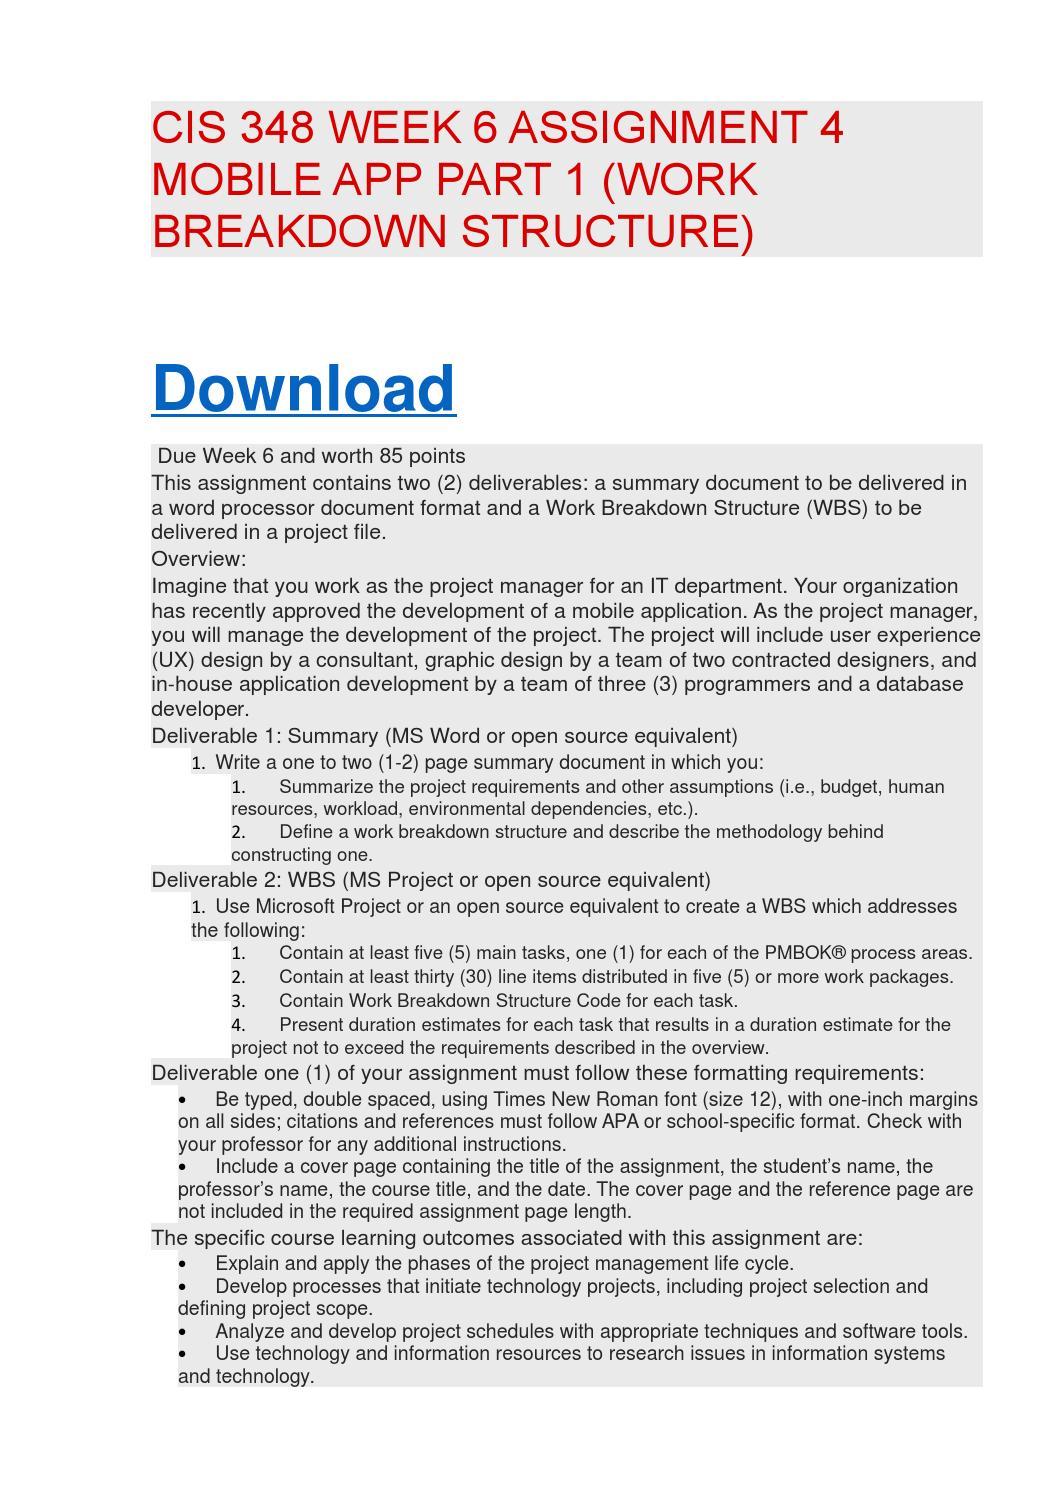 mobile application development work breakdown structure